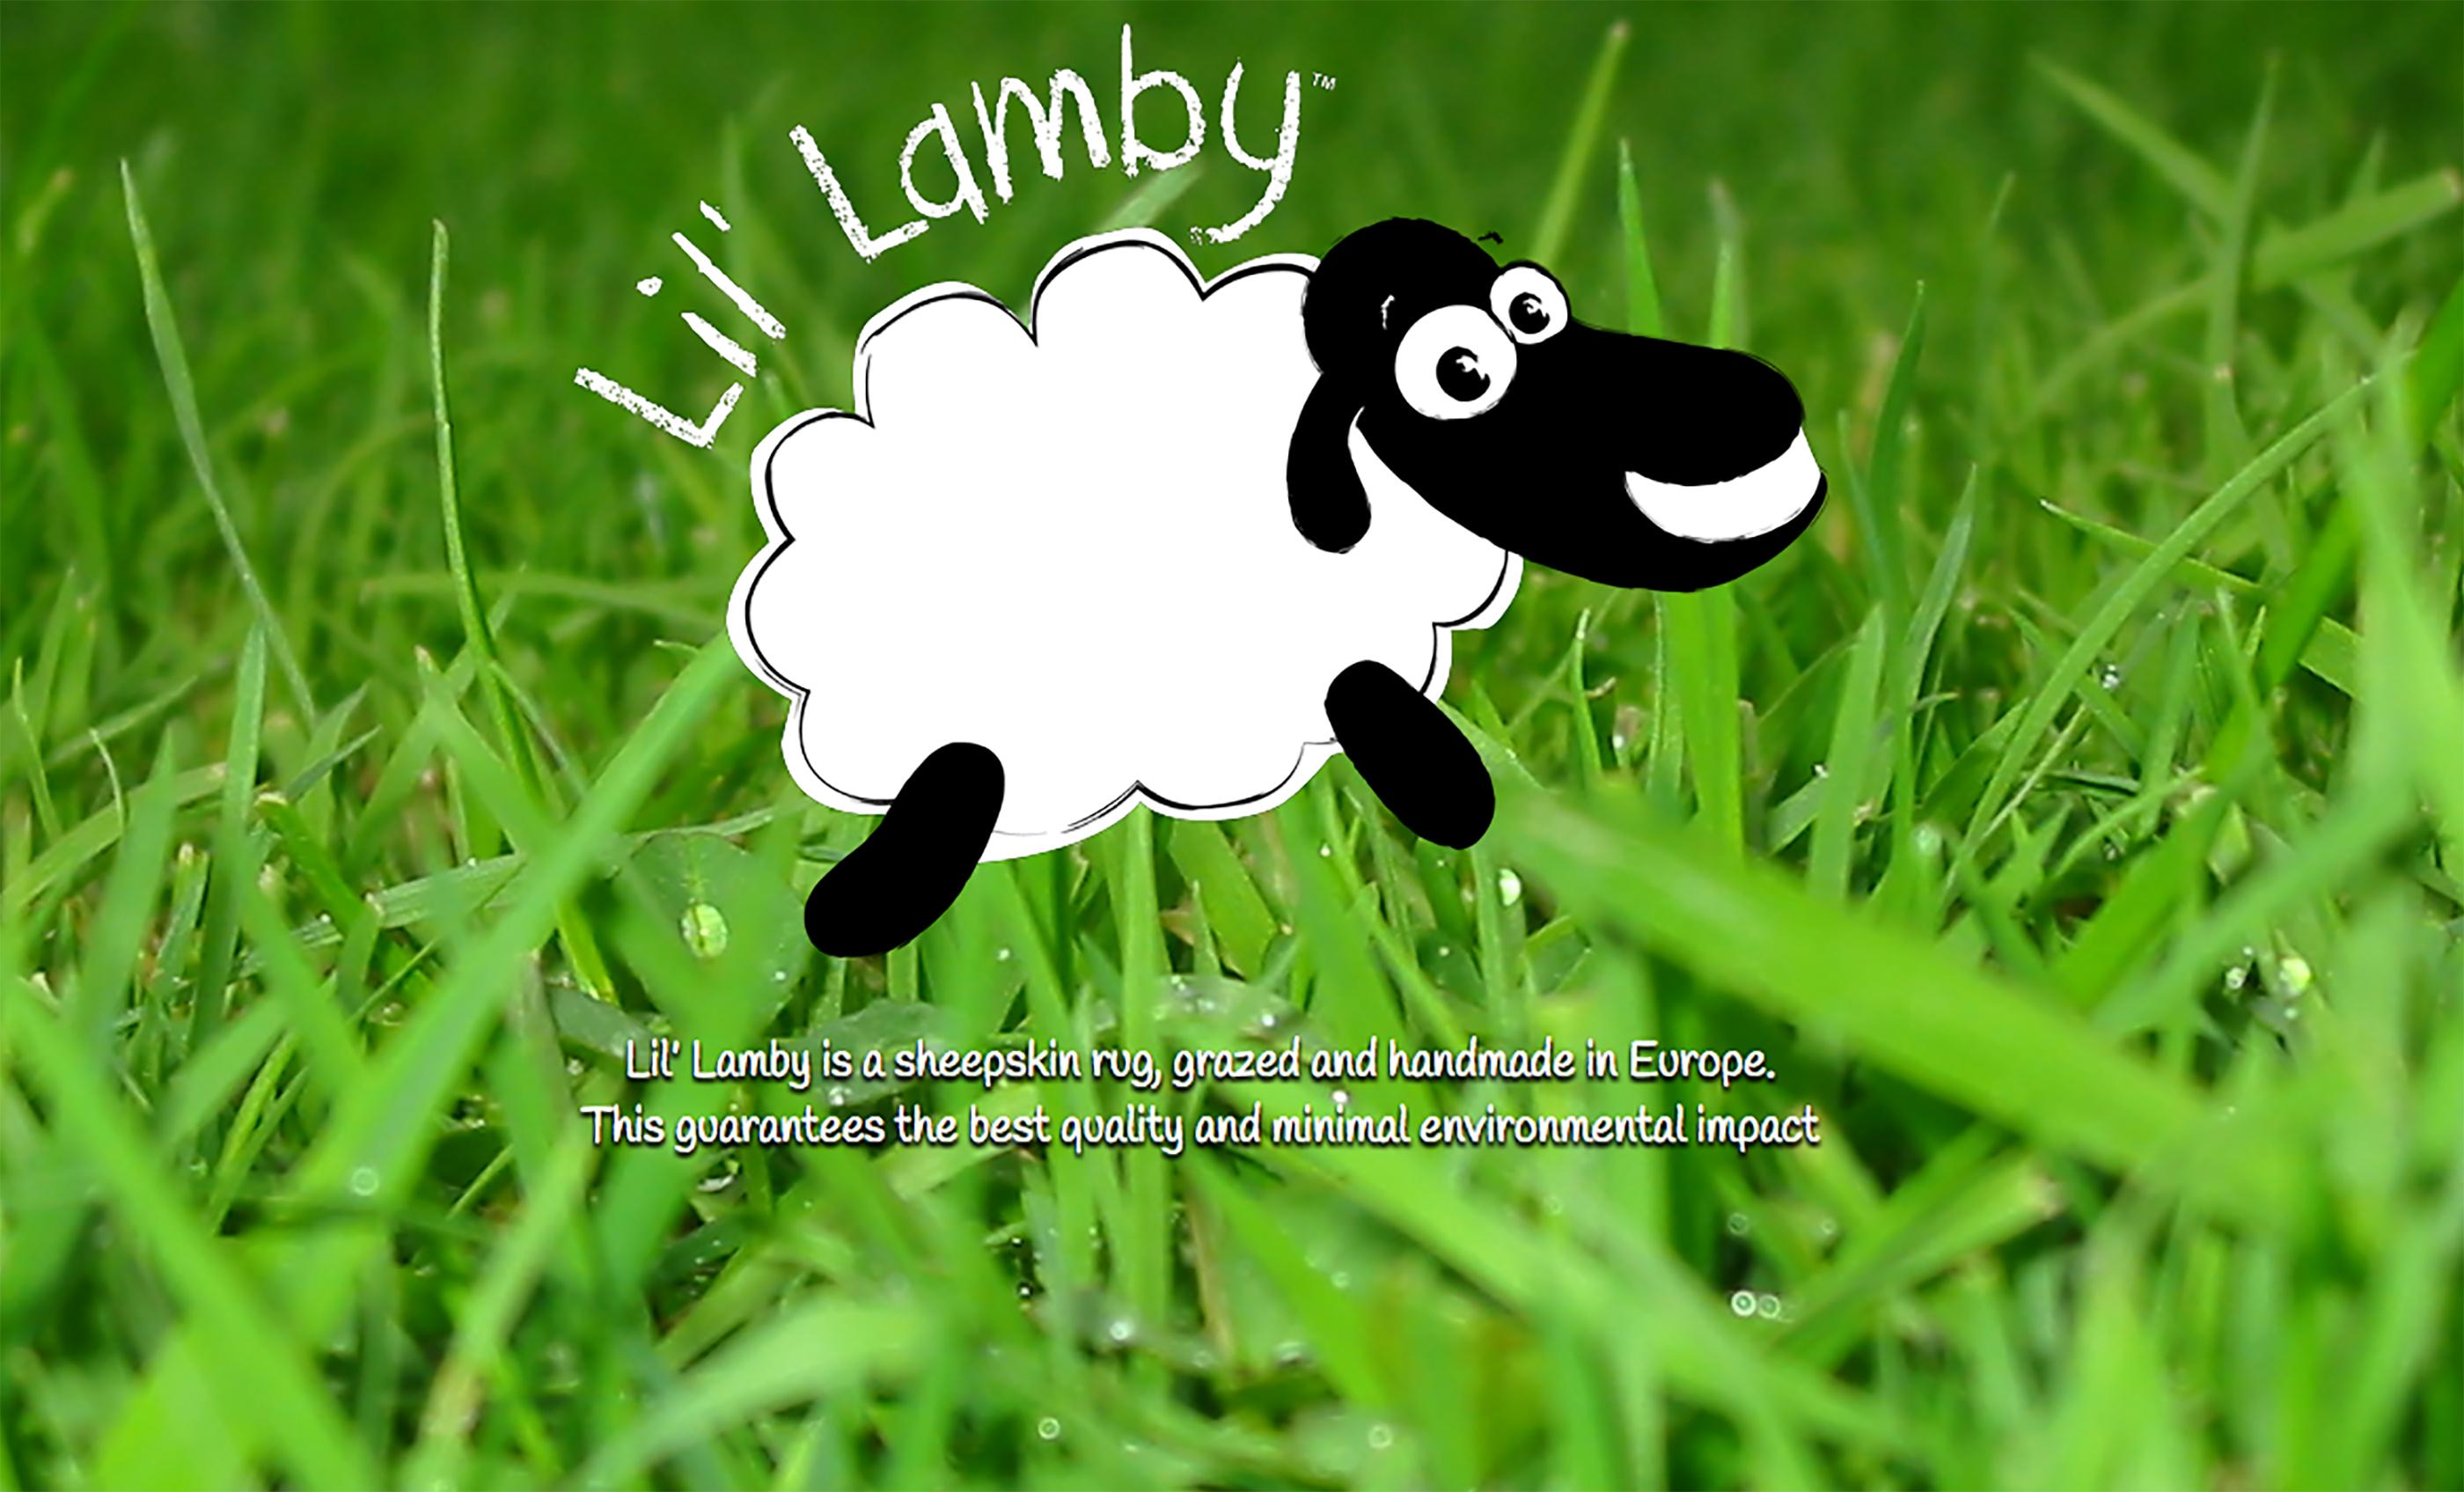 Lil' Lamby